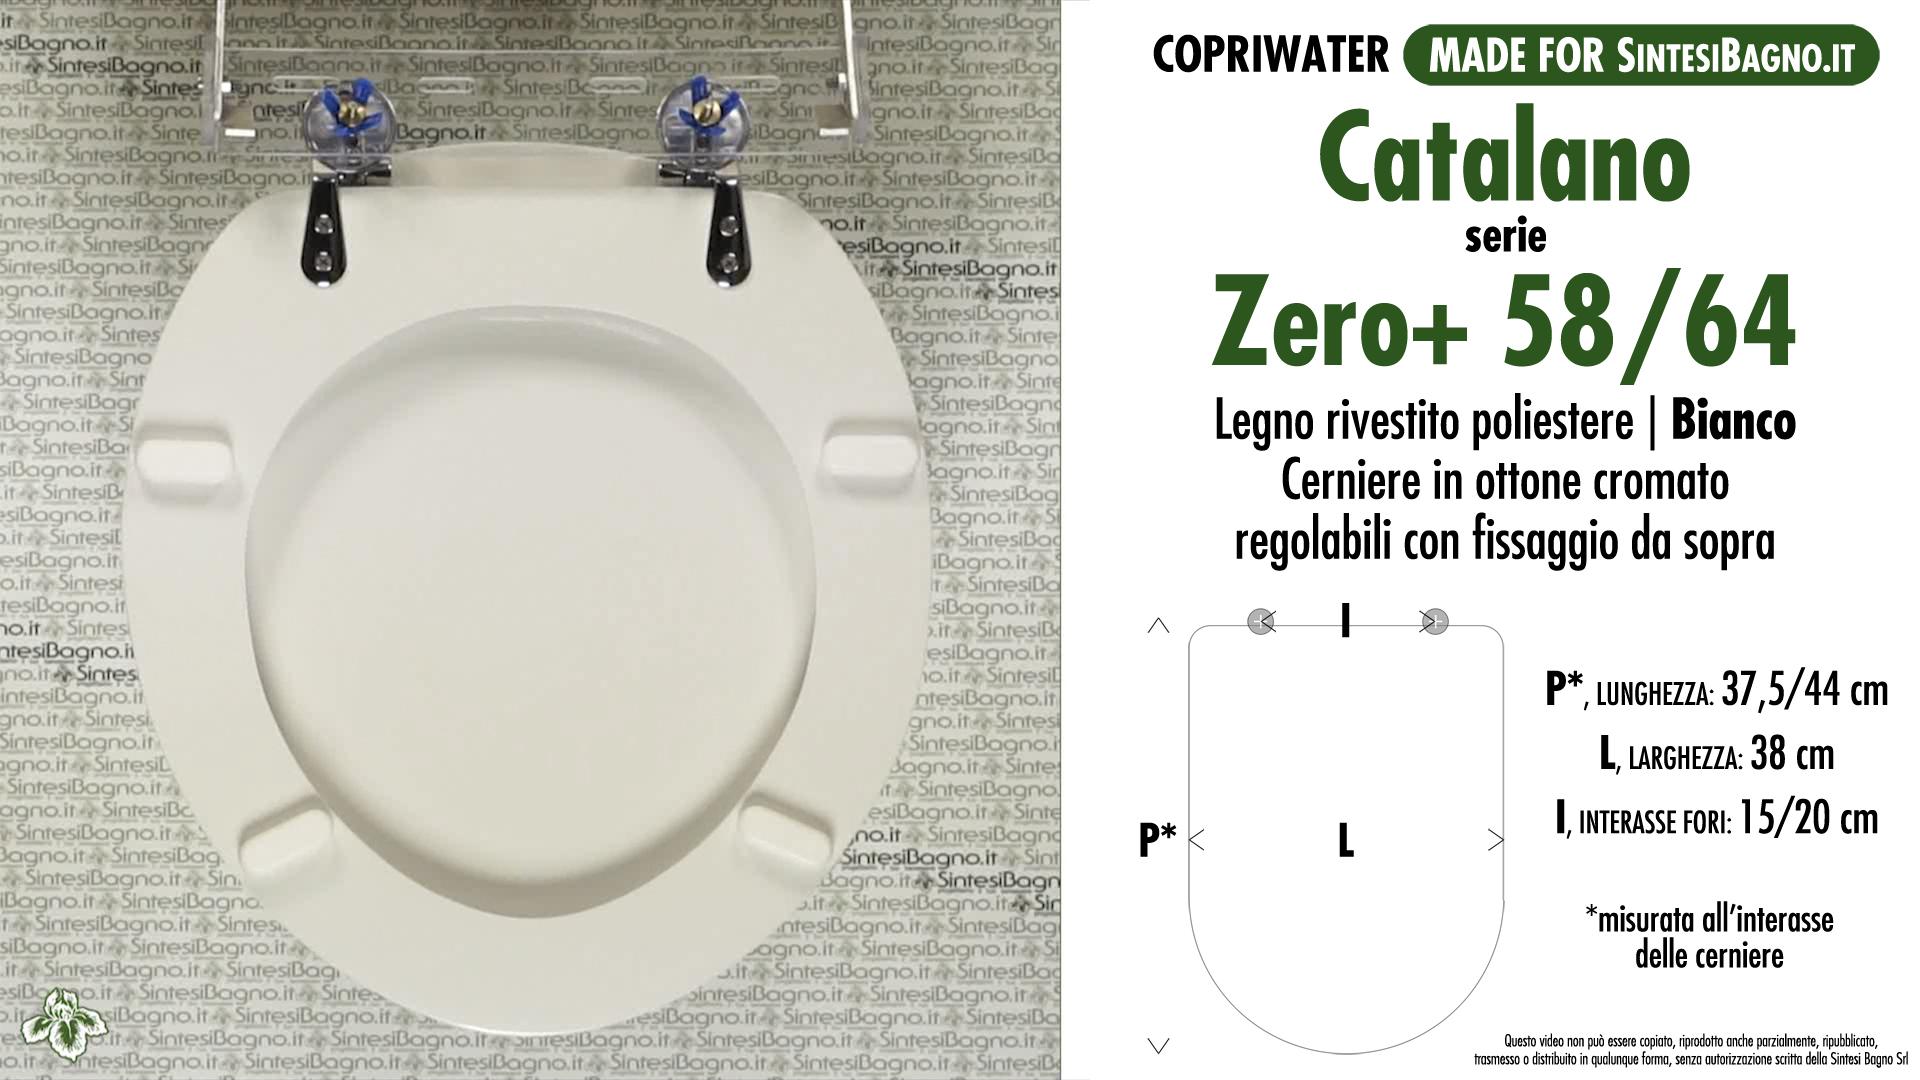 scheda-tecnica-datasheet-copriwater-catalano-serie-zero-piu-58-64